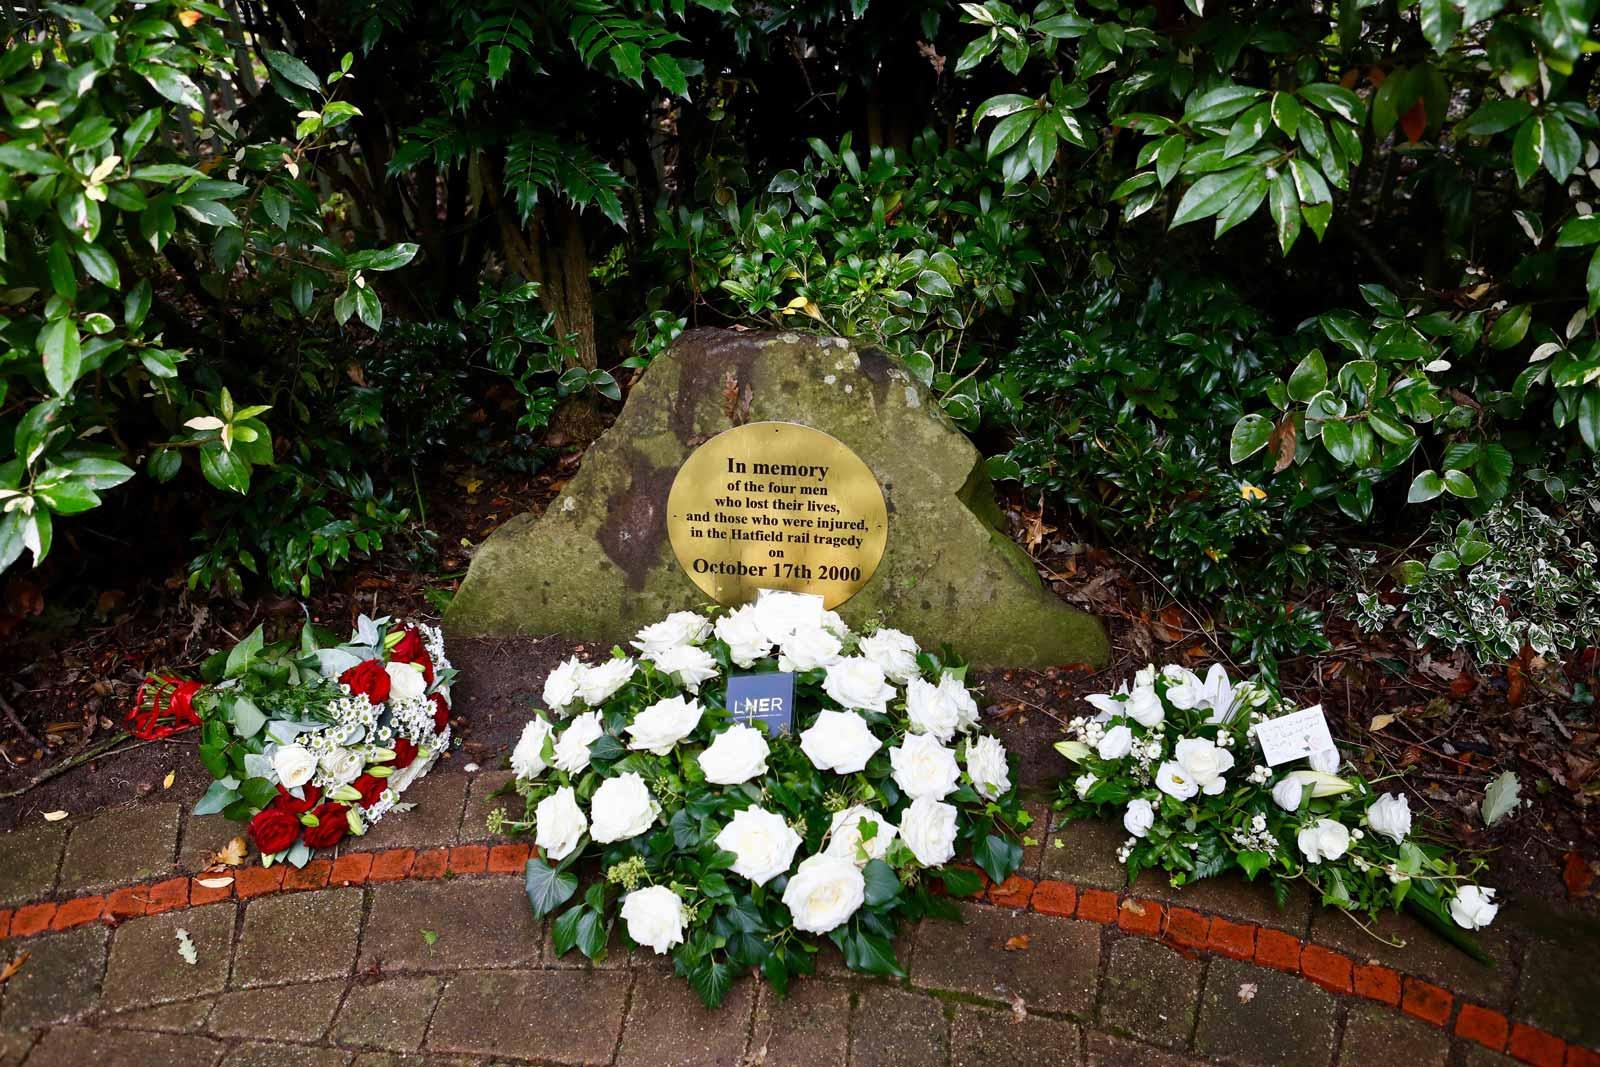 The Hatfield rail tragedy 21st anniversary memorial